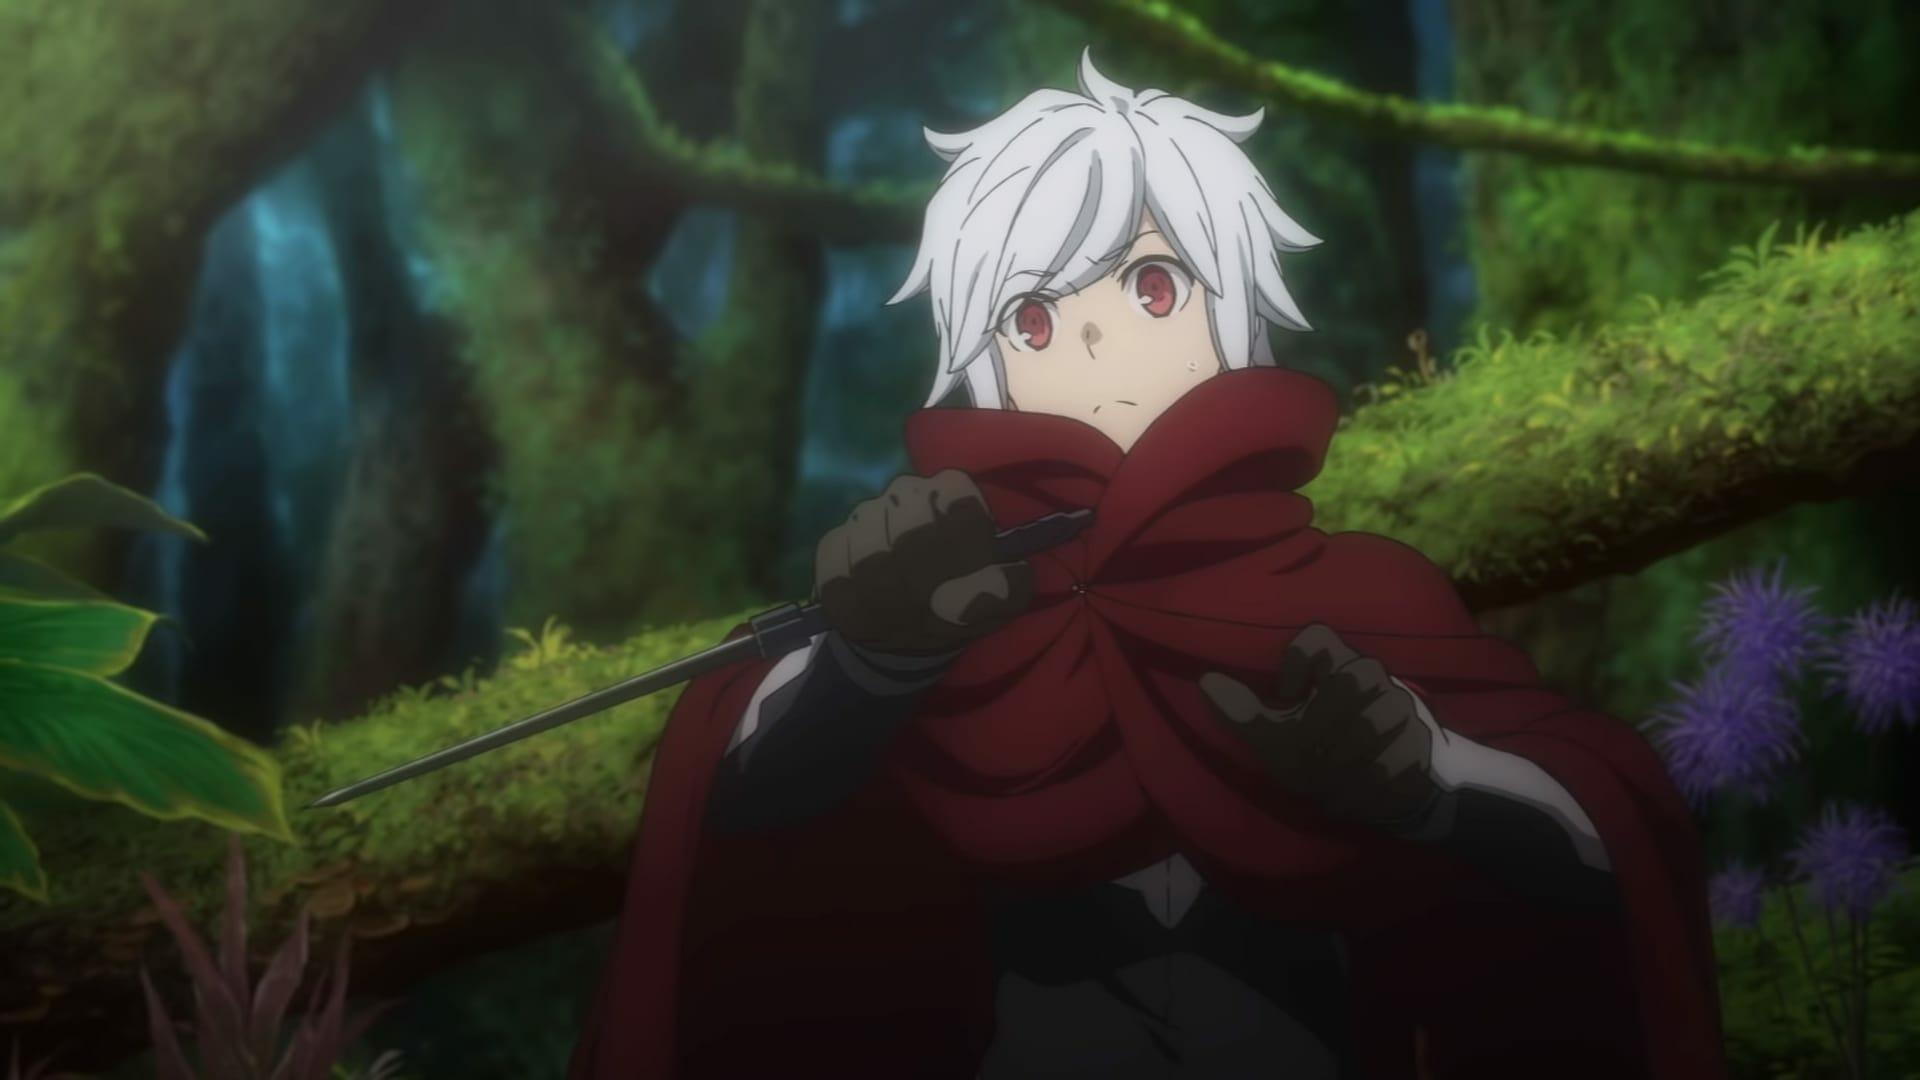 Danmachi season 3 anime